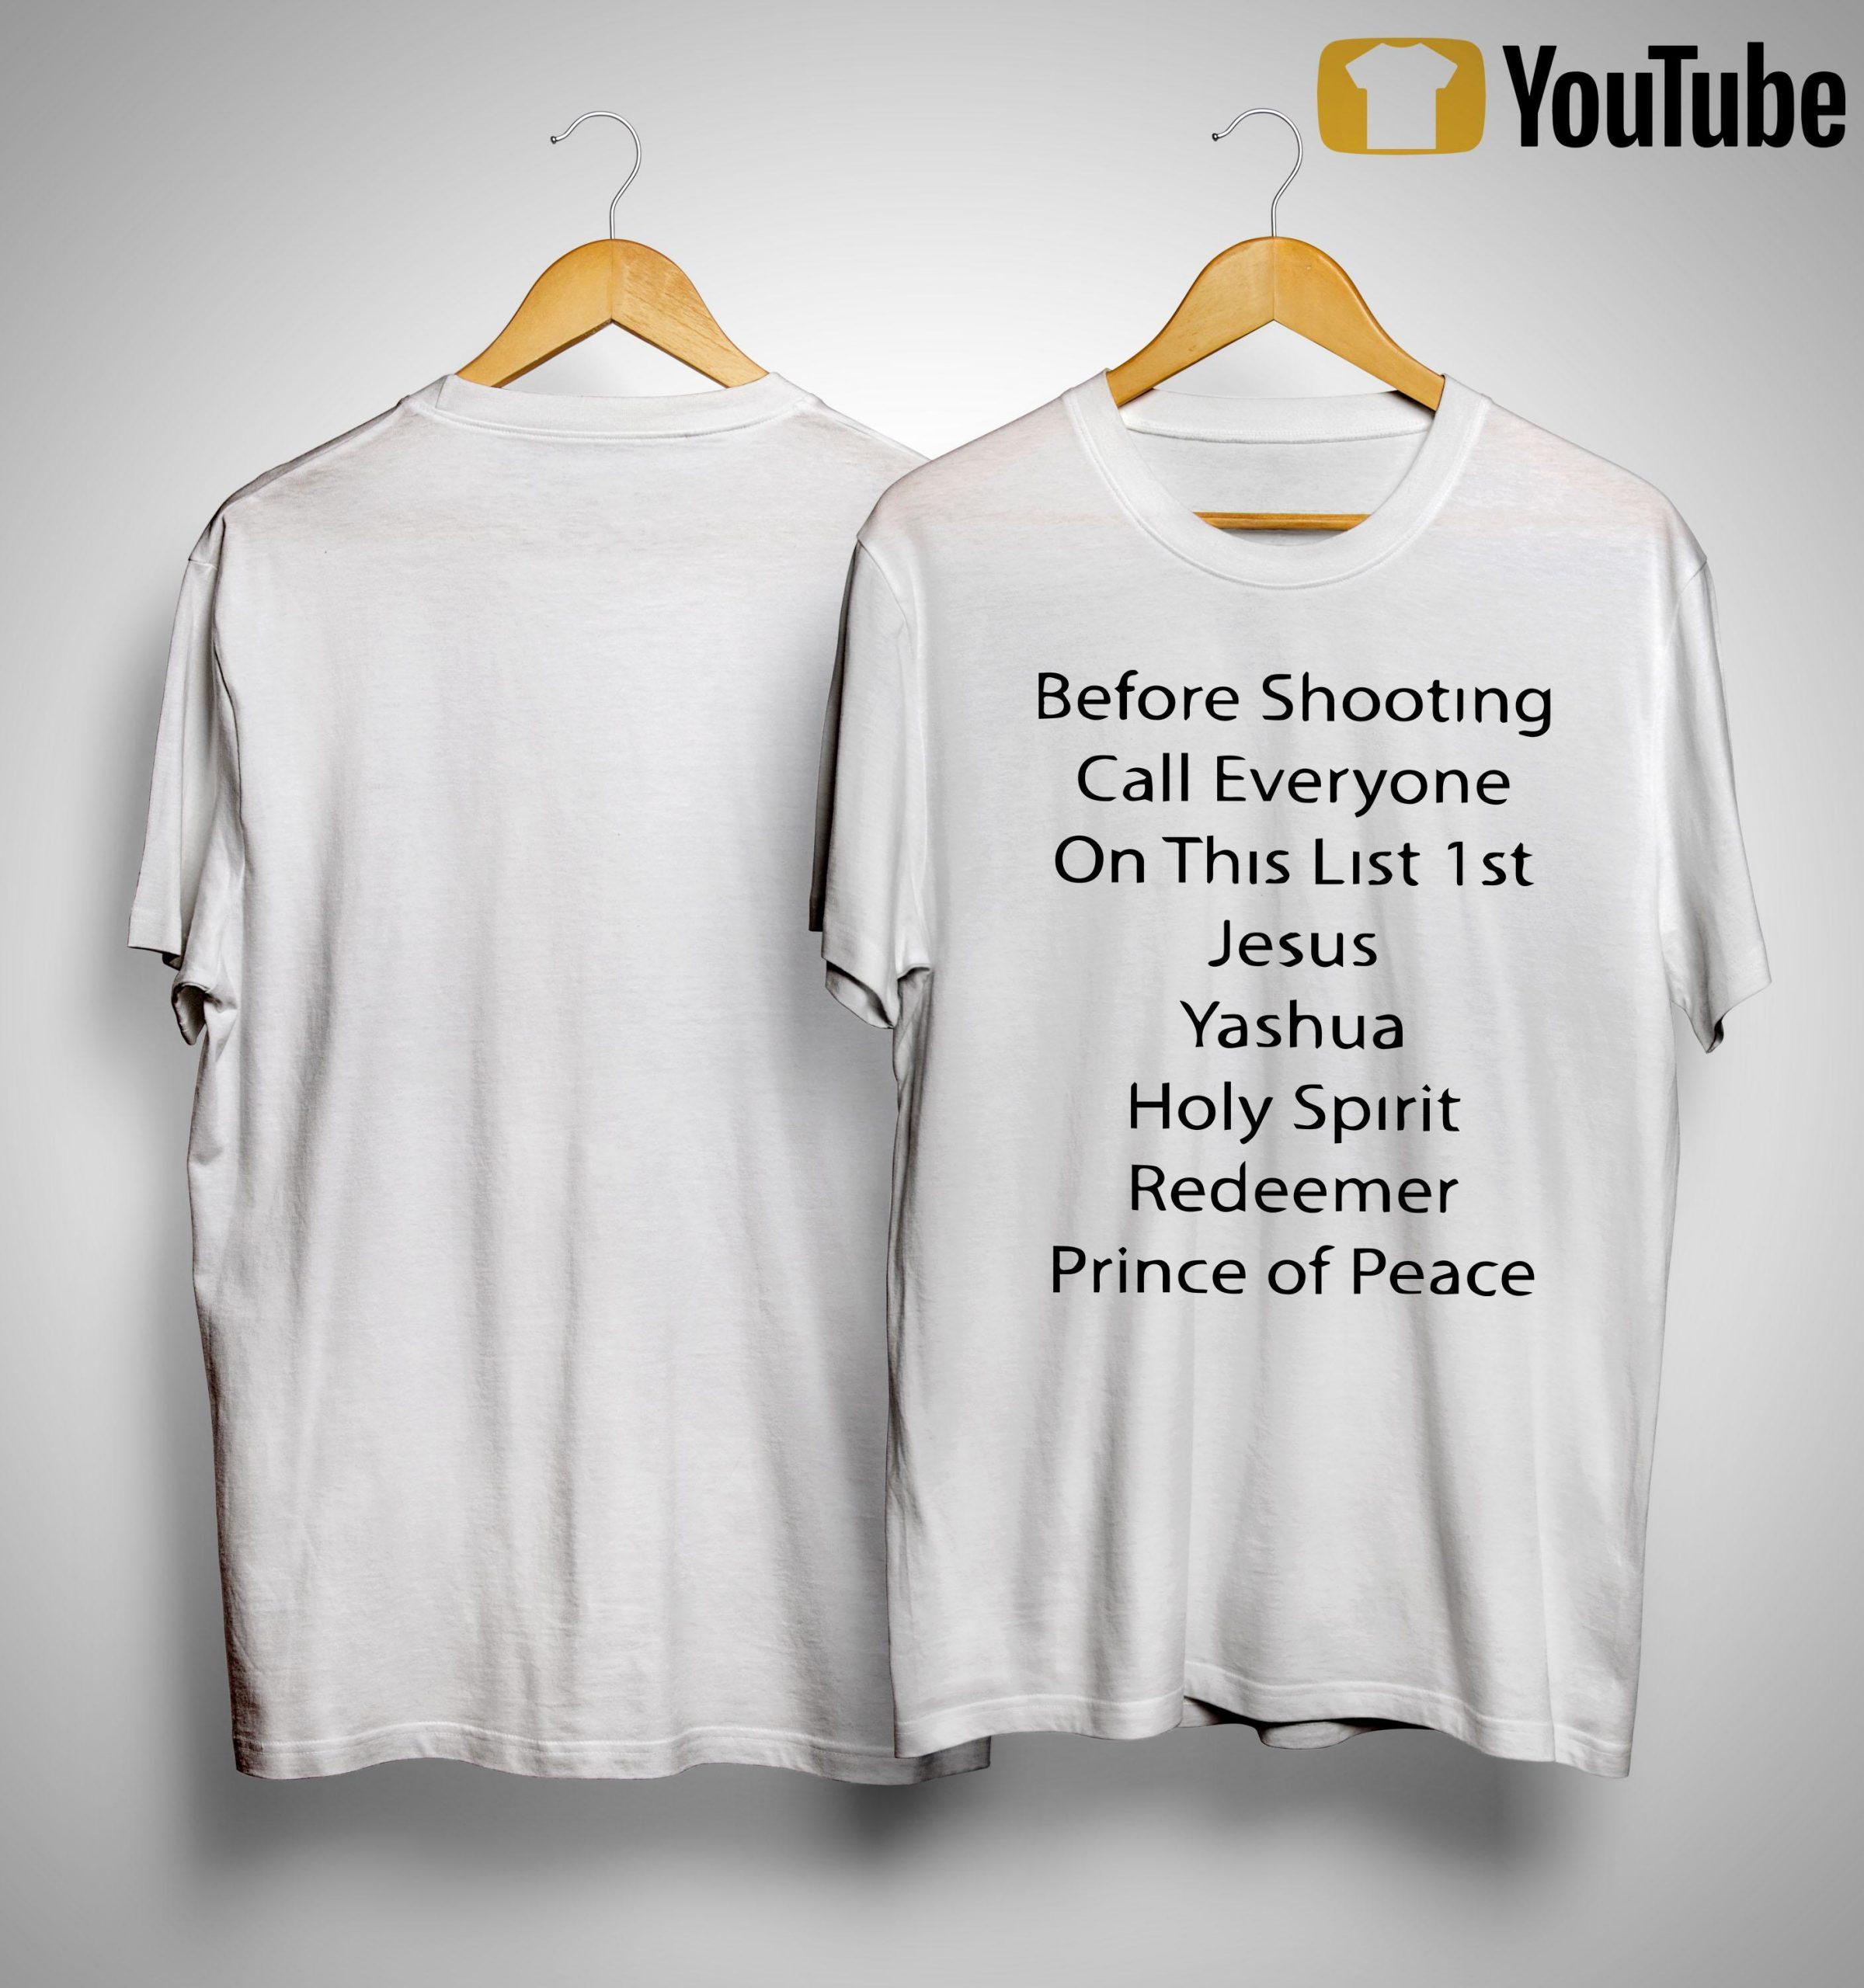 Before Shooting Call Everyone On This List 1st Jesus Yashua Shirt